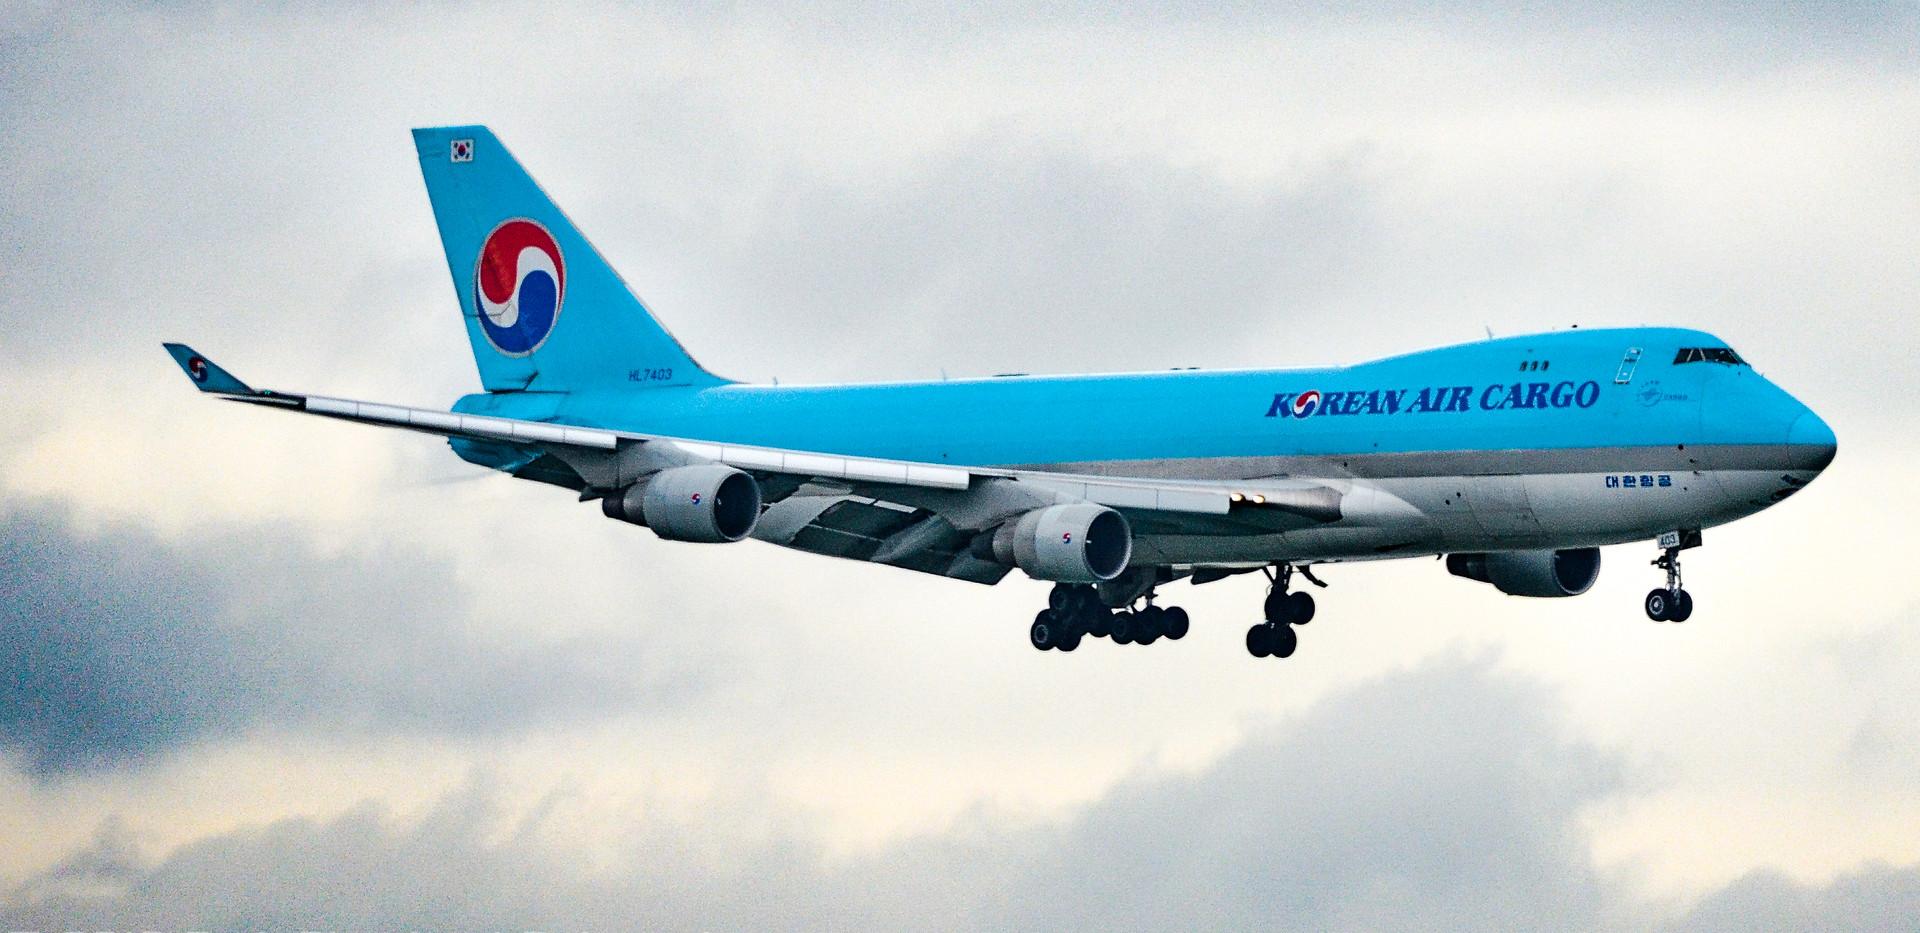 Korean Air Cargo Boeing 747 Freighter HKG